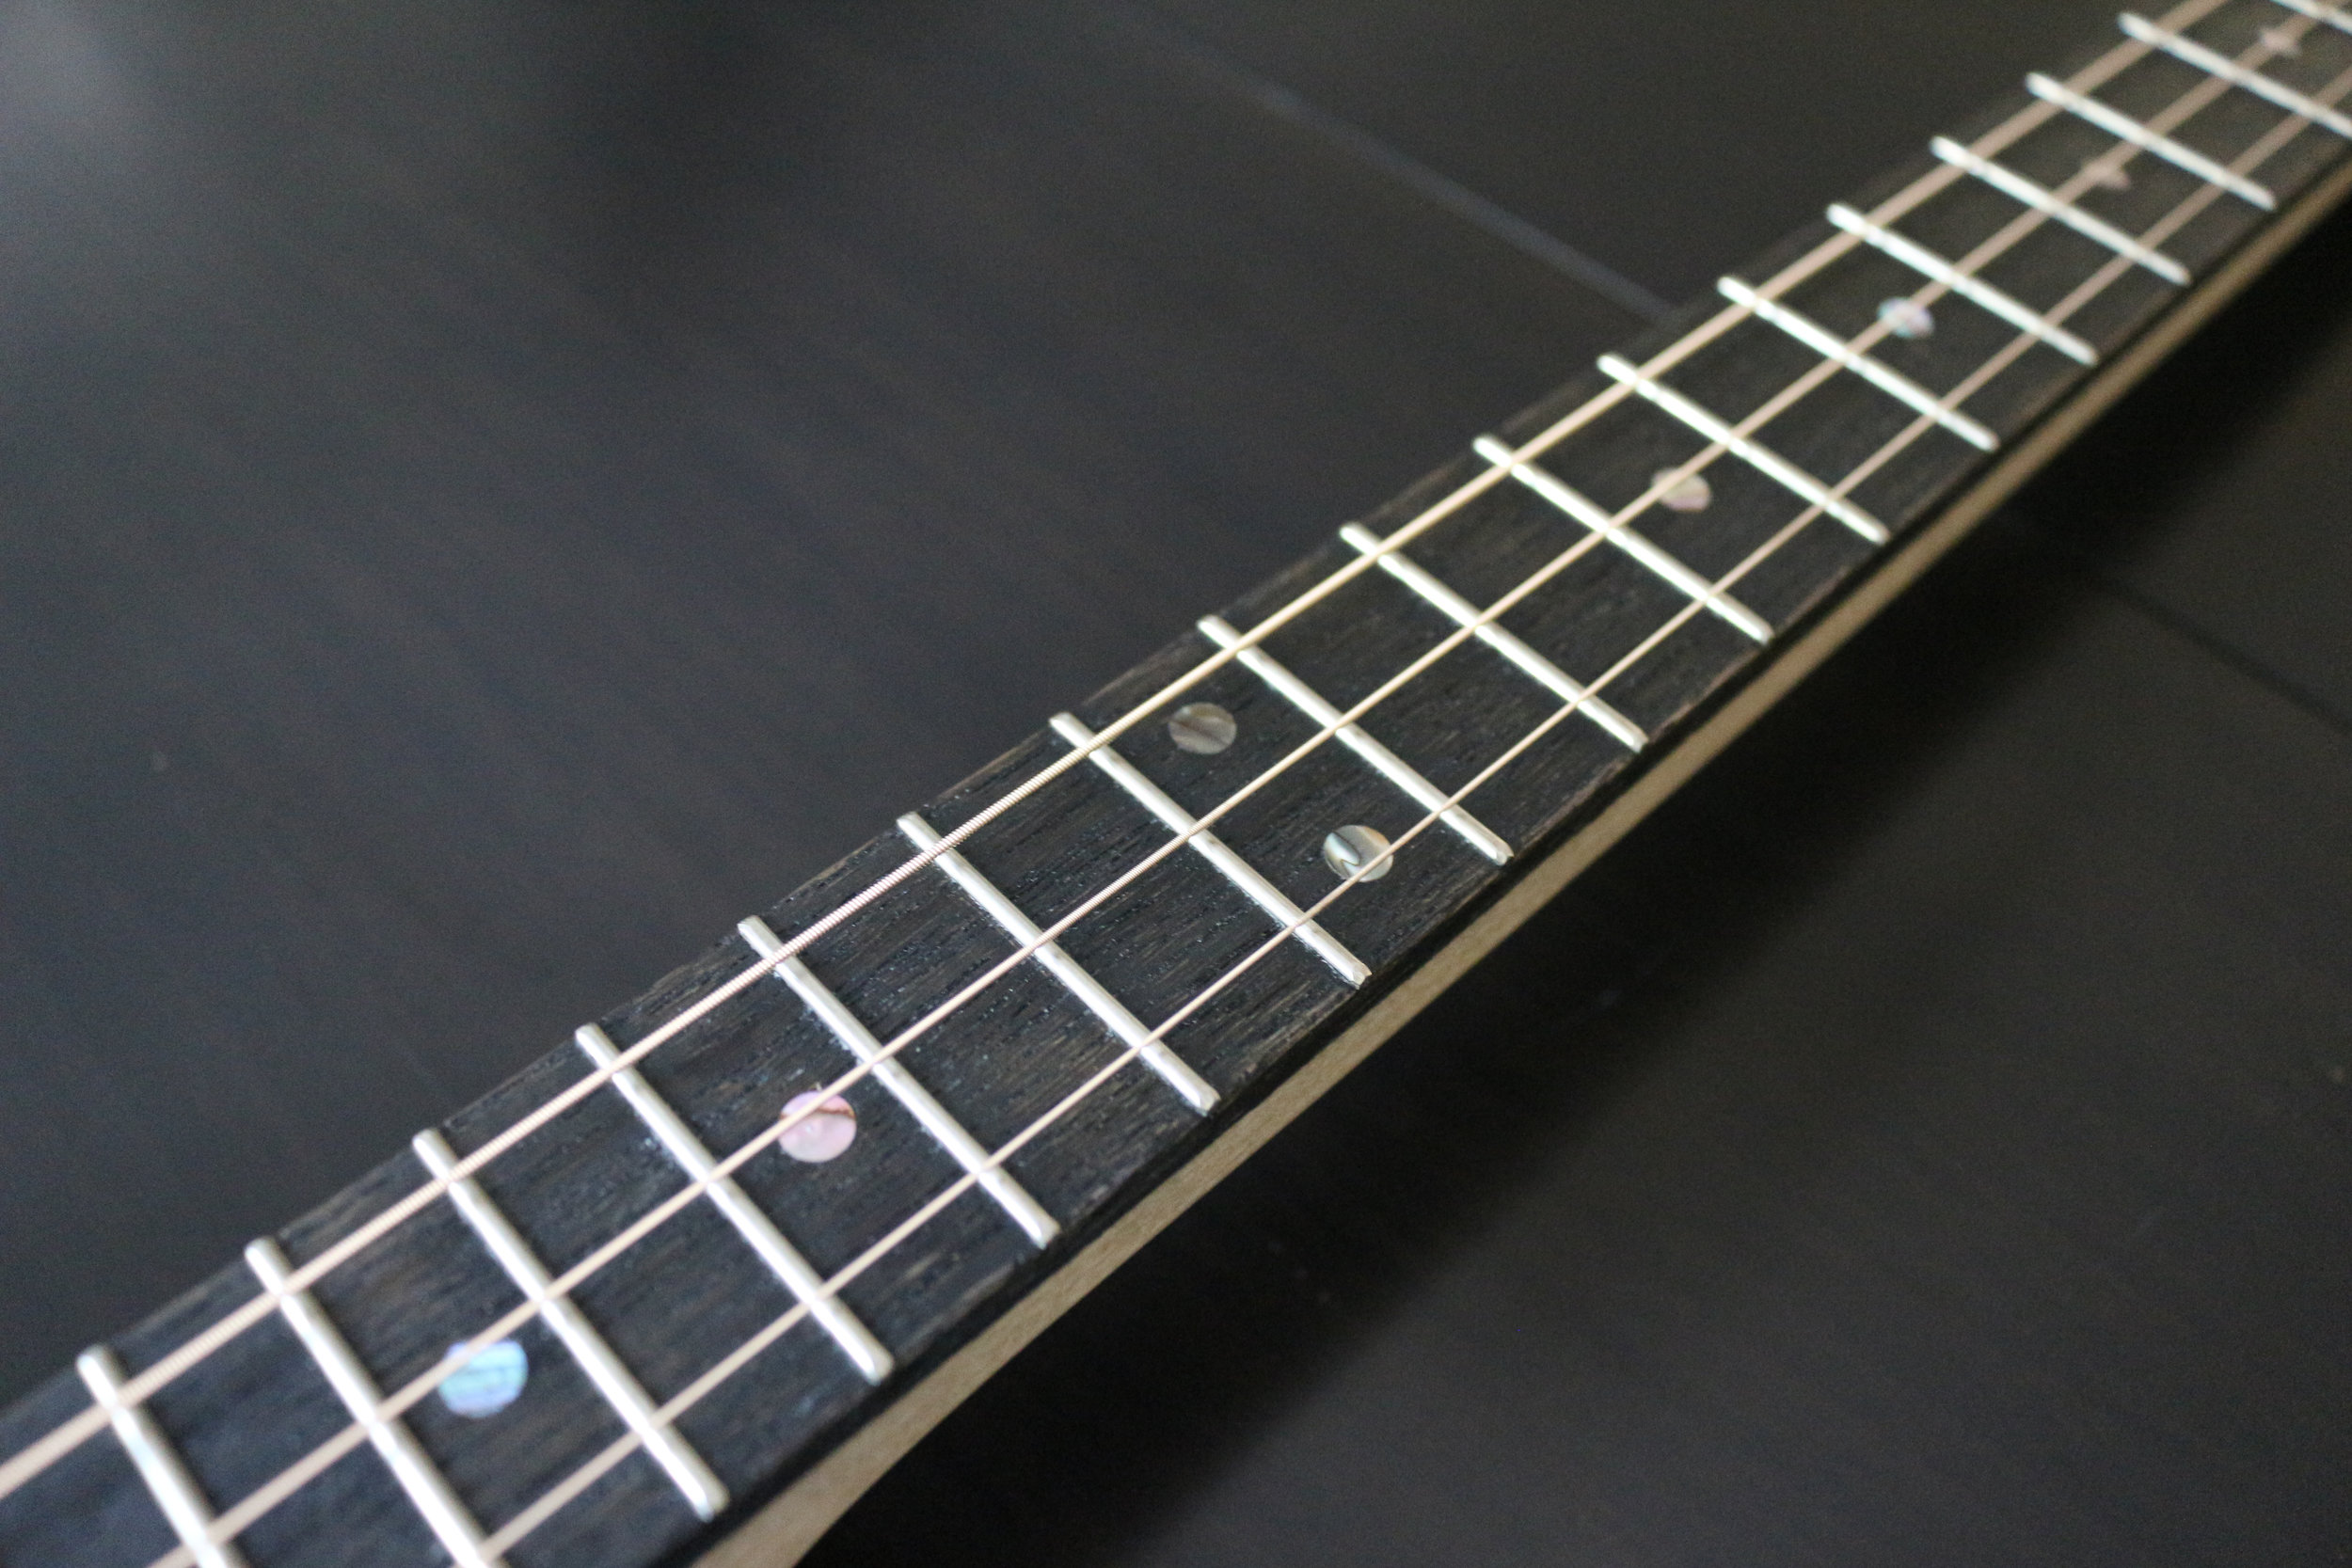 3x3 Custom Three String Guitar